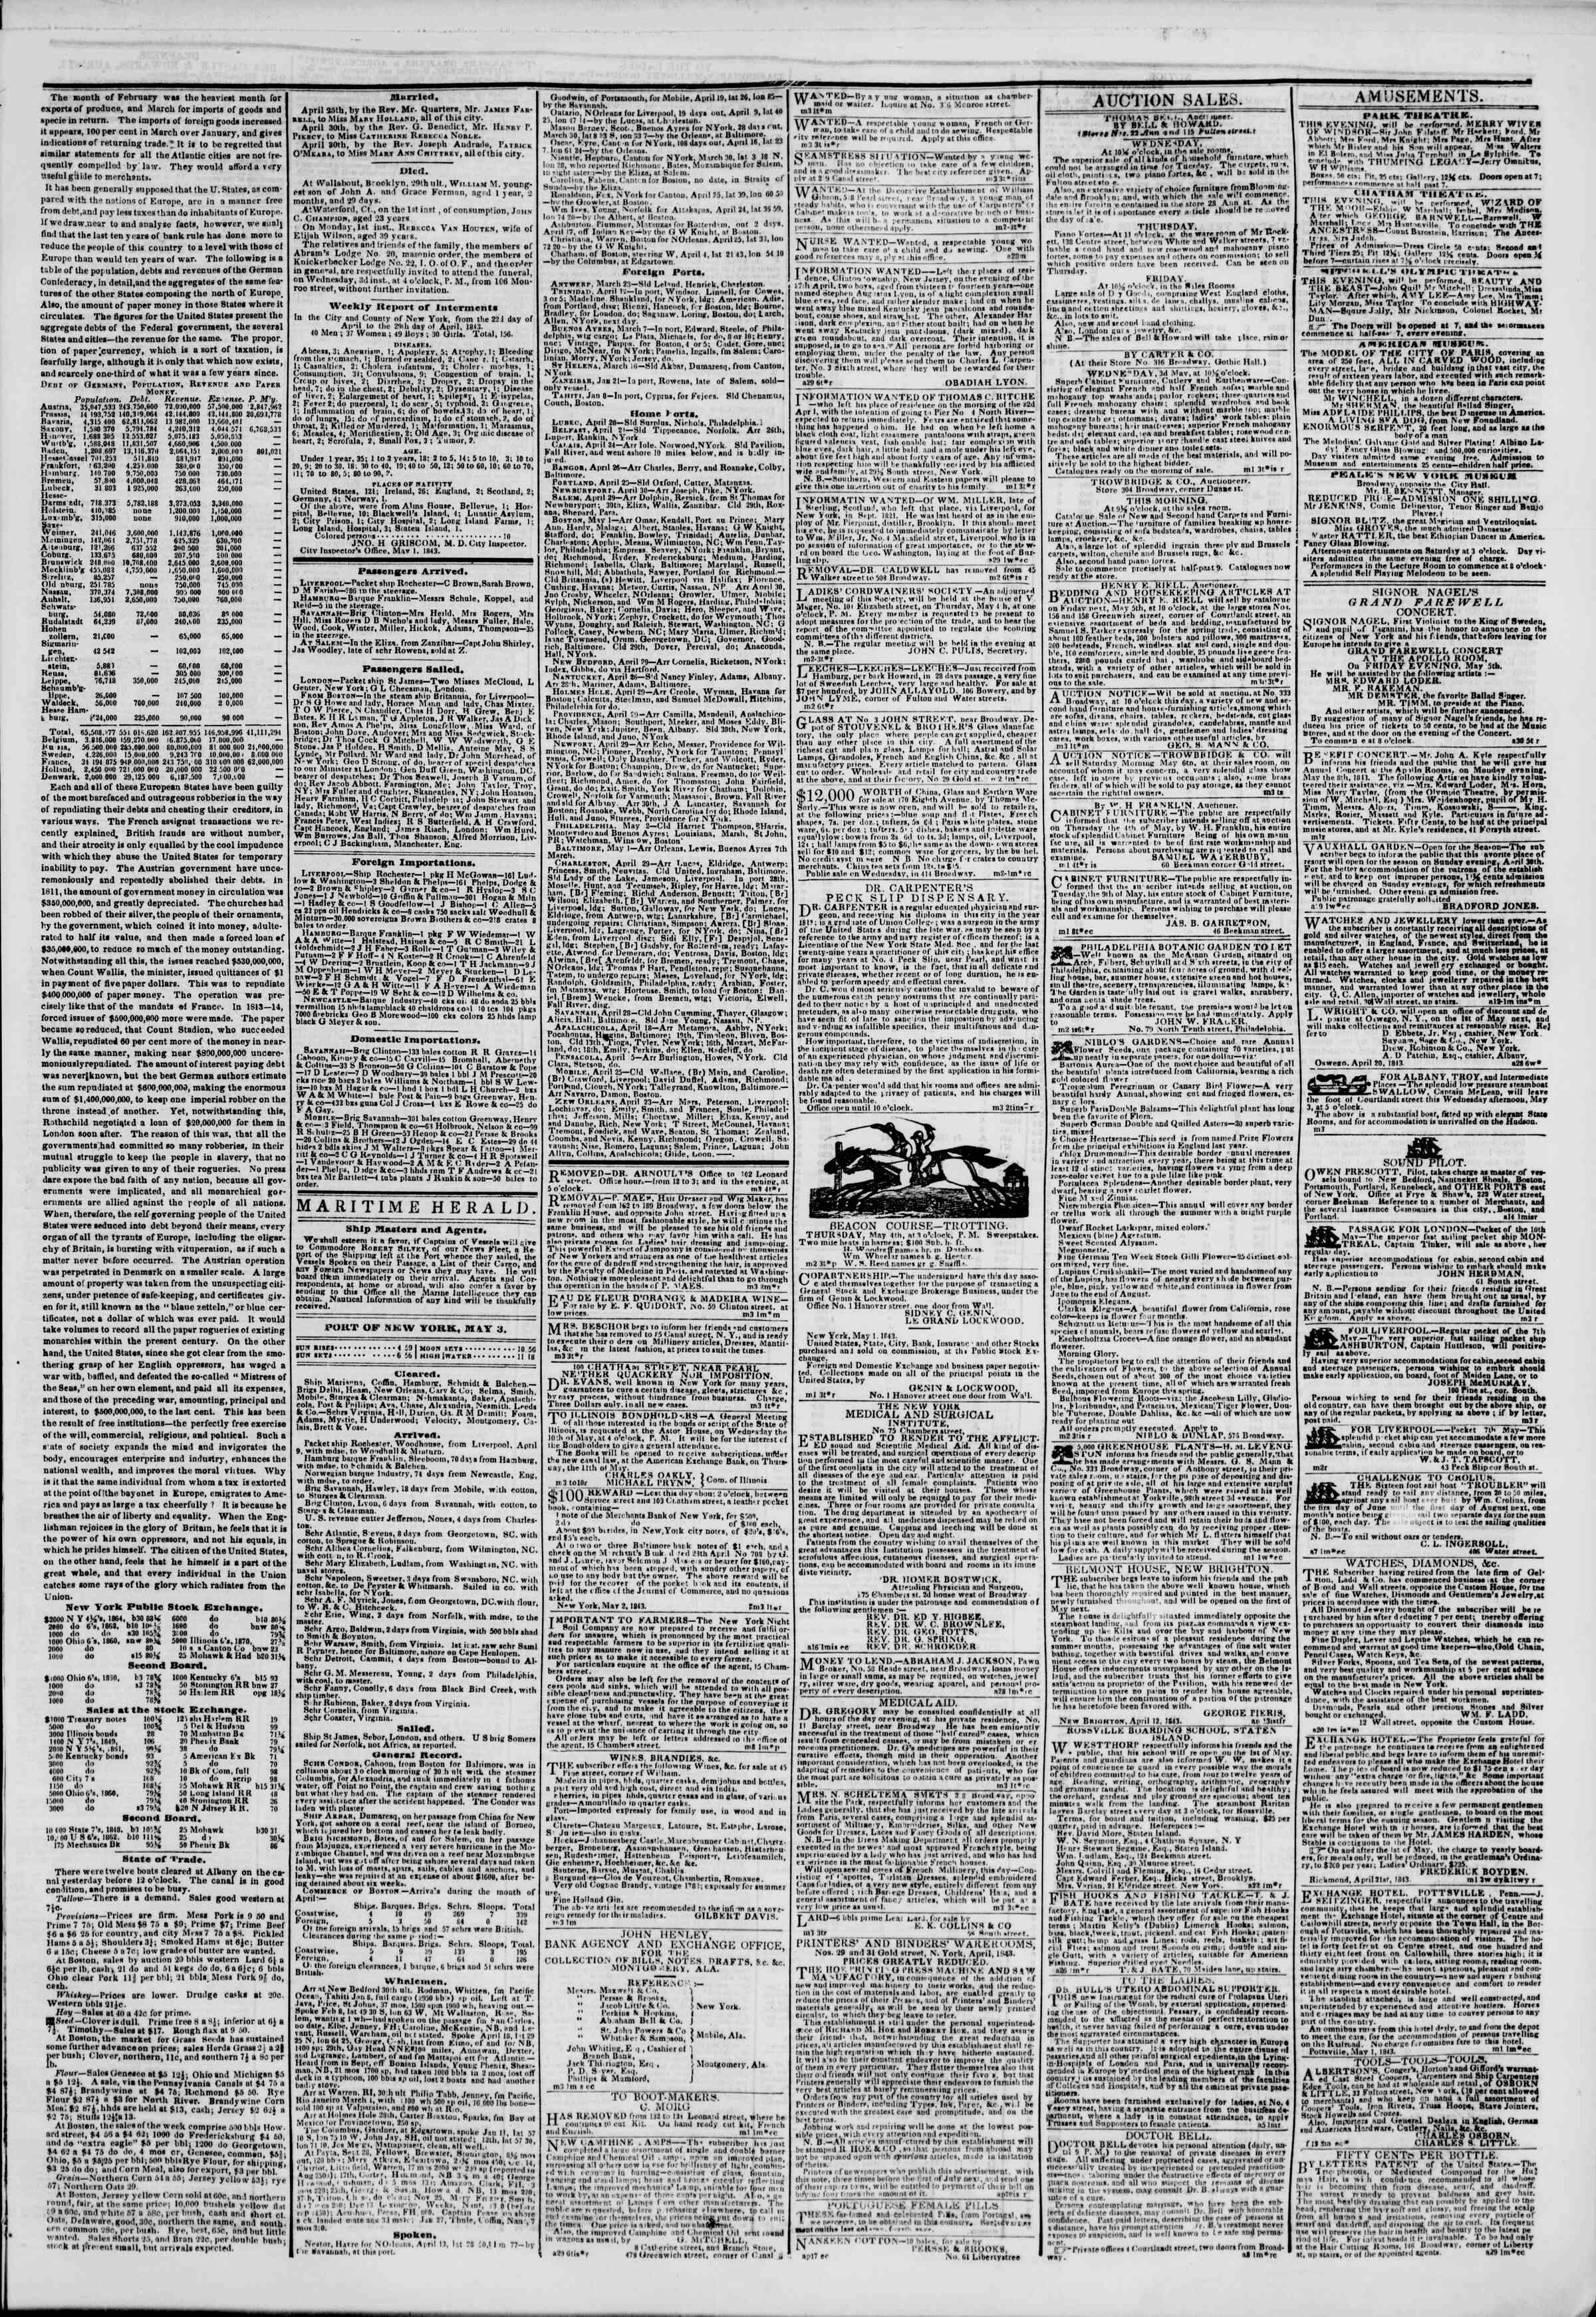 May 3, 1843 Tarihli The New York Herald Gazetesi Sayfa 3